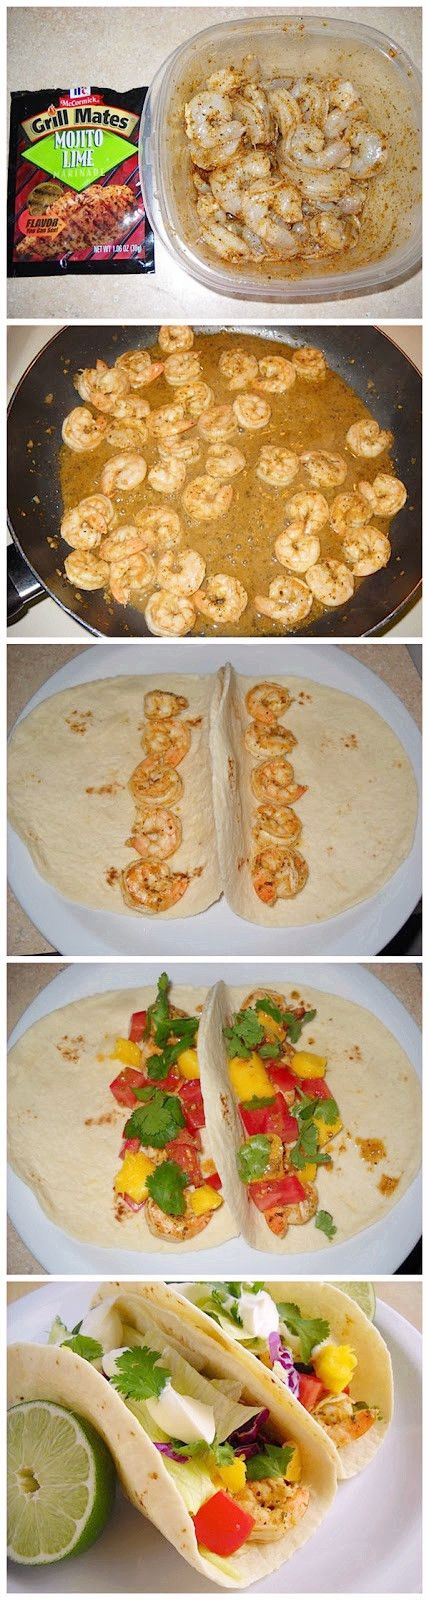 beats by drew Super Simple Shrimp Tacos  Joybx  Get Yacked